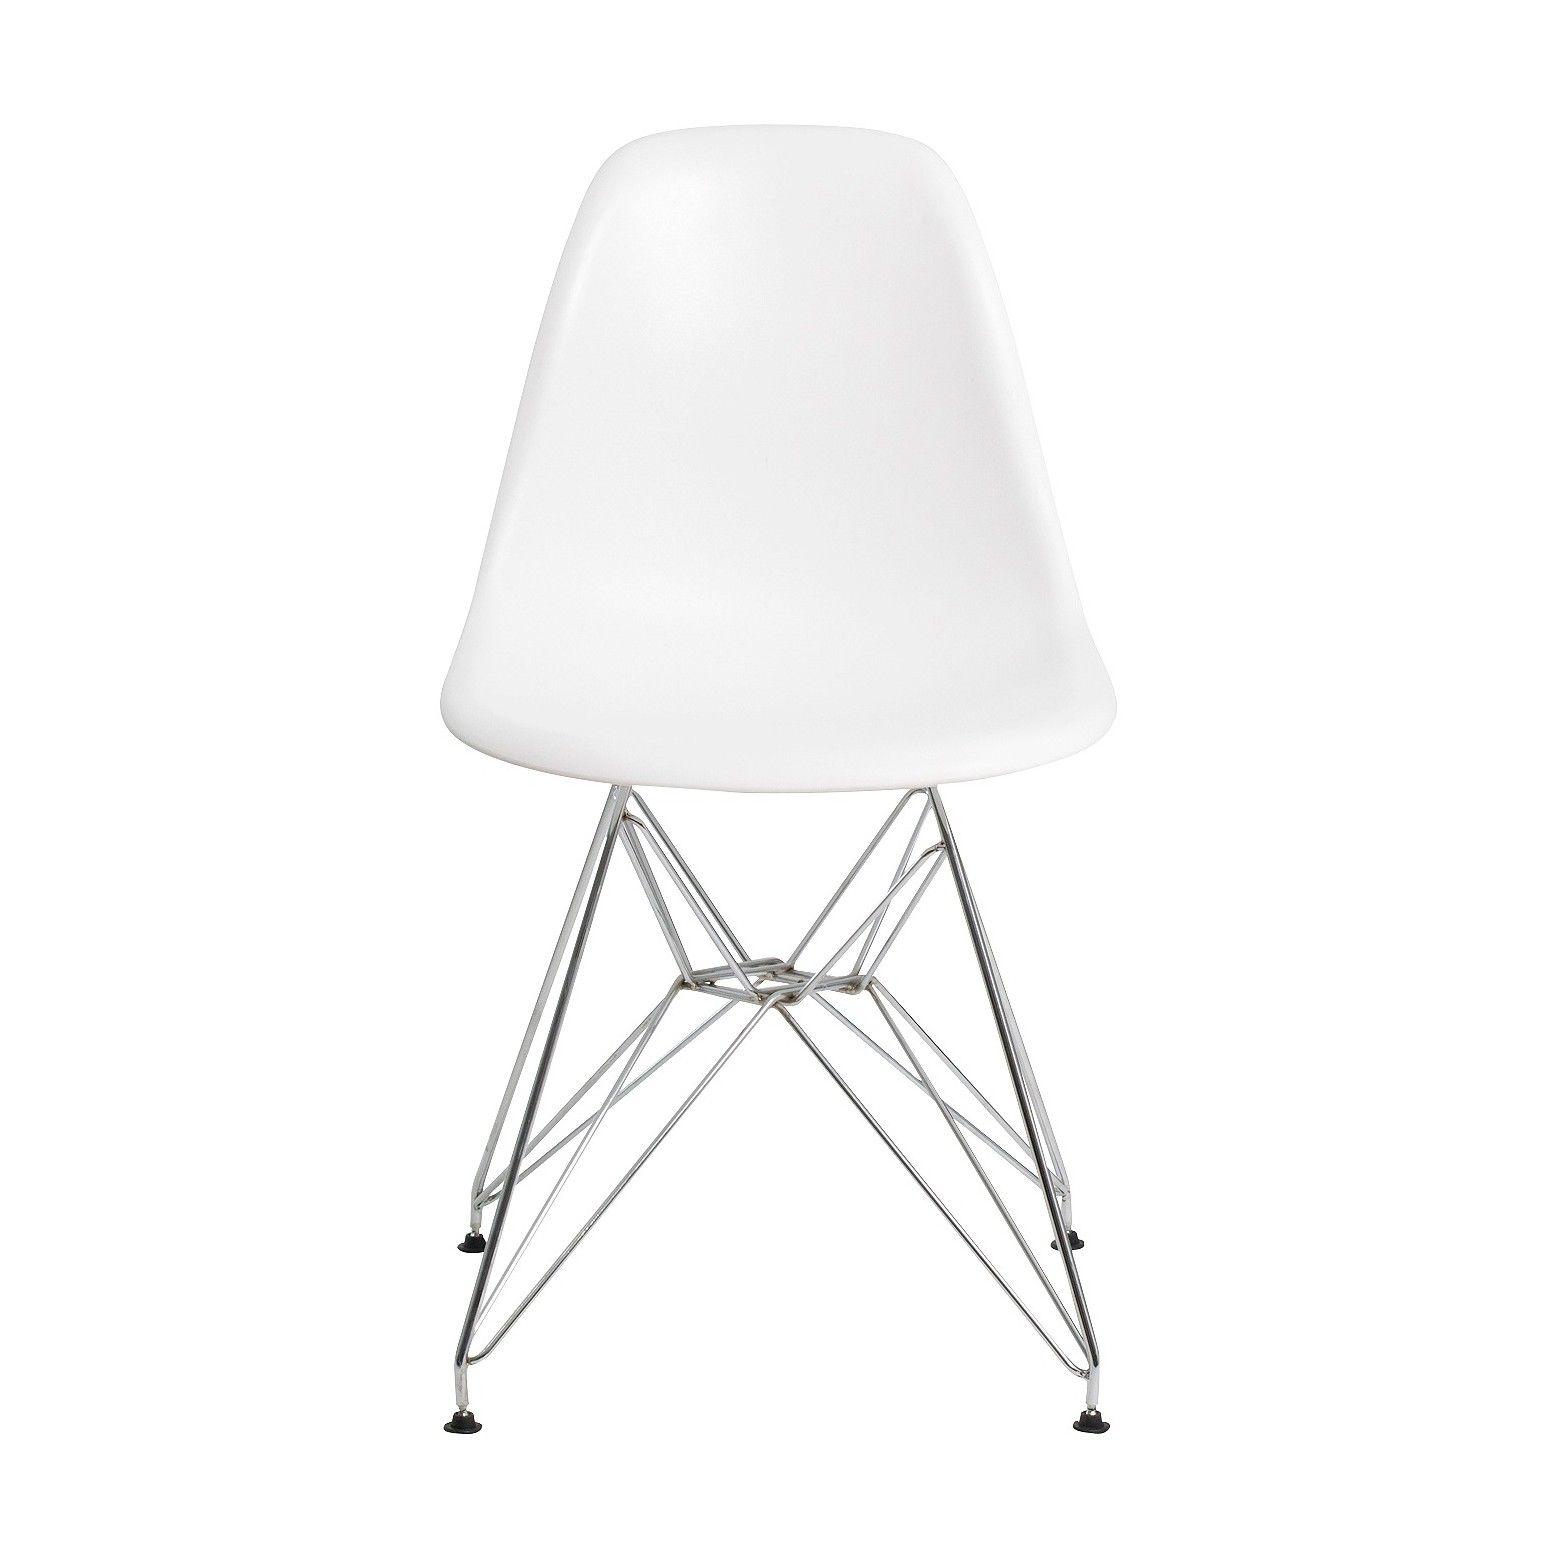 Set Of 2 Paris Molded Plastic Chair White Aeon Molded Plastic Chairs Plastic Chair Molded Chair